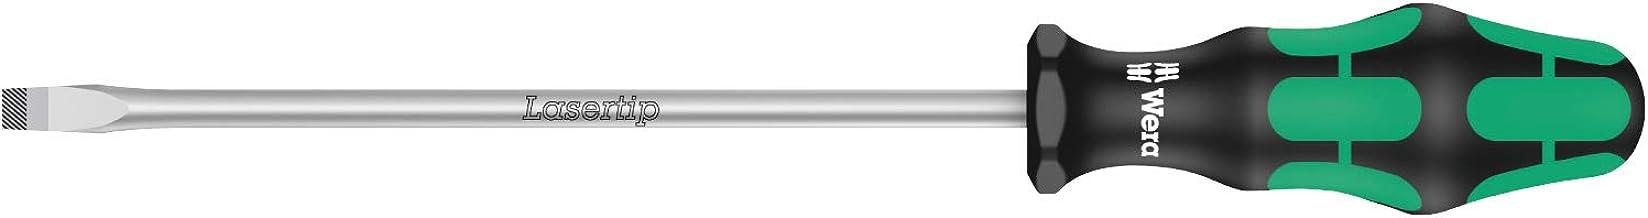 Wera 05110011001 Kraftform Plus 334 Slotted Screwdriver, Lasertip, 7mm Head, 7 Inch Blade Length